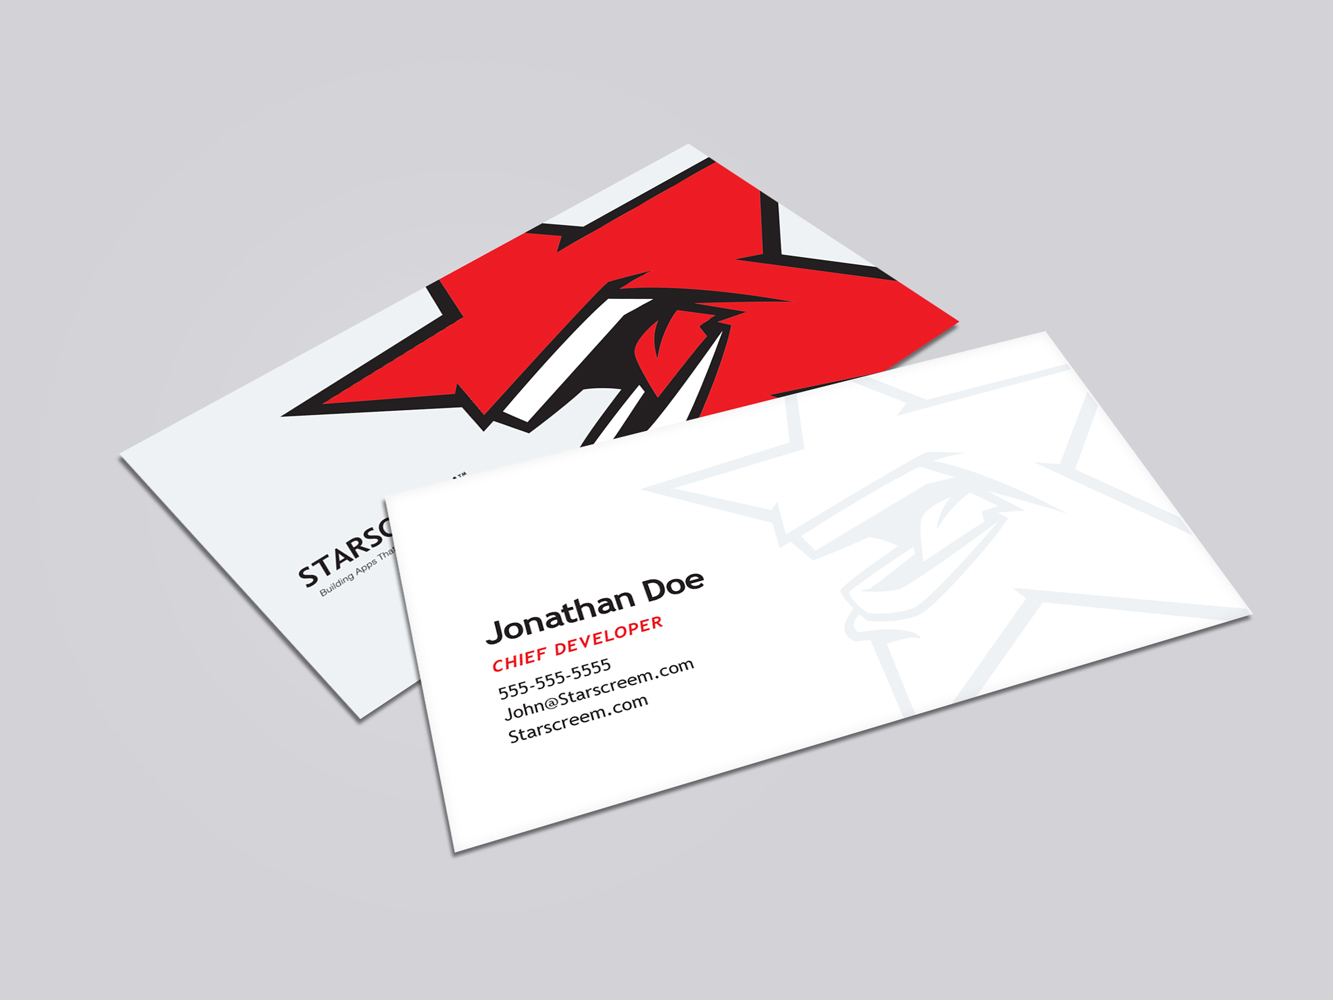 Starscreem_Business_card_01a